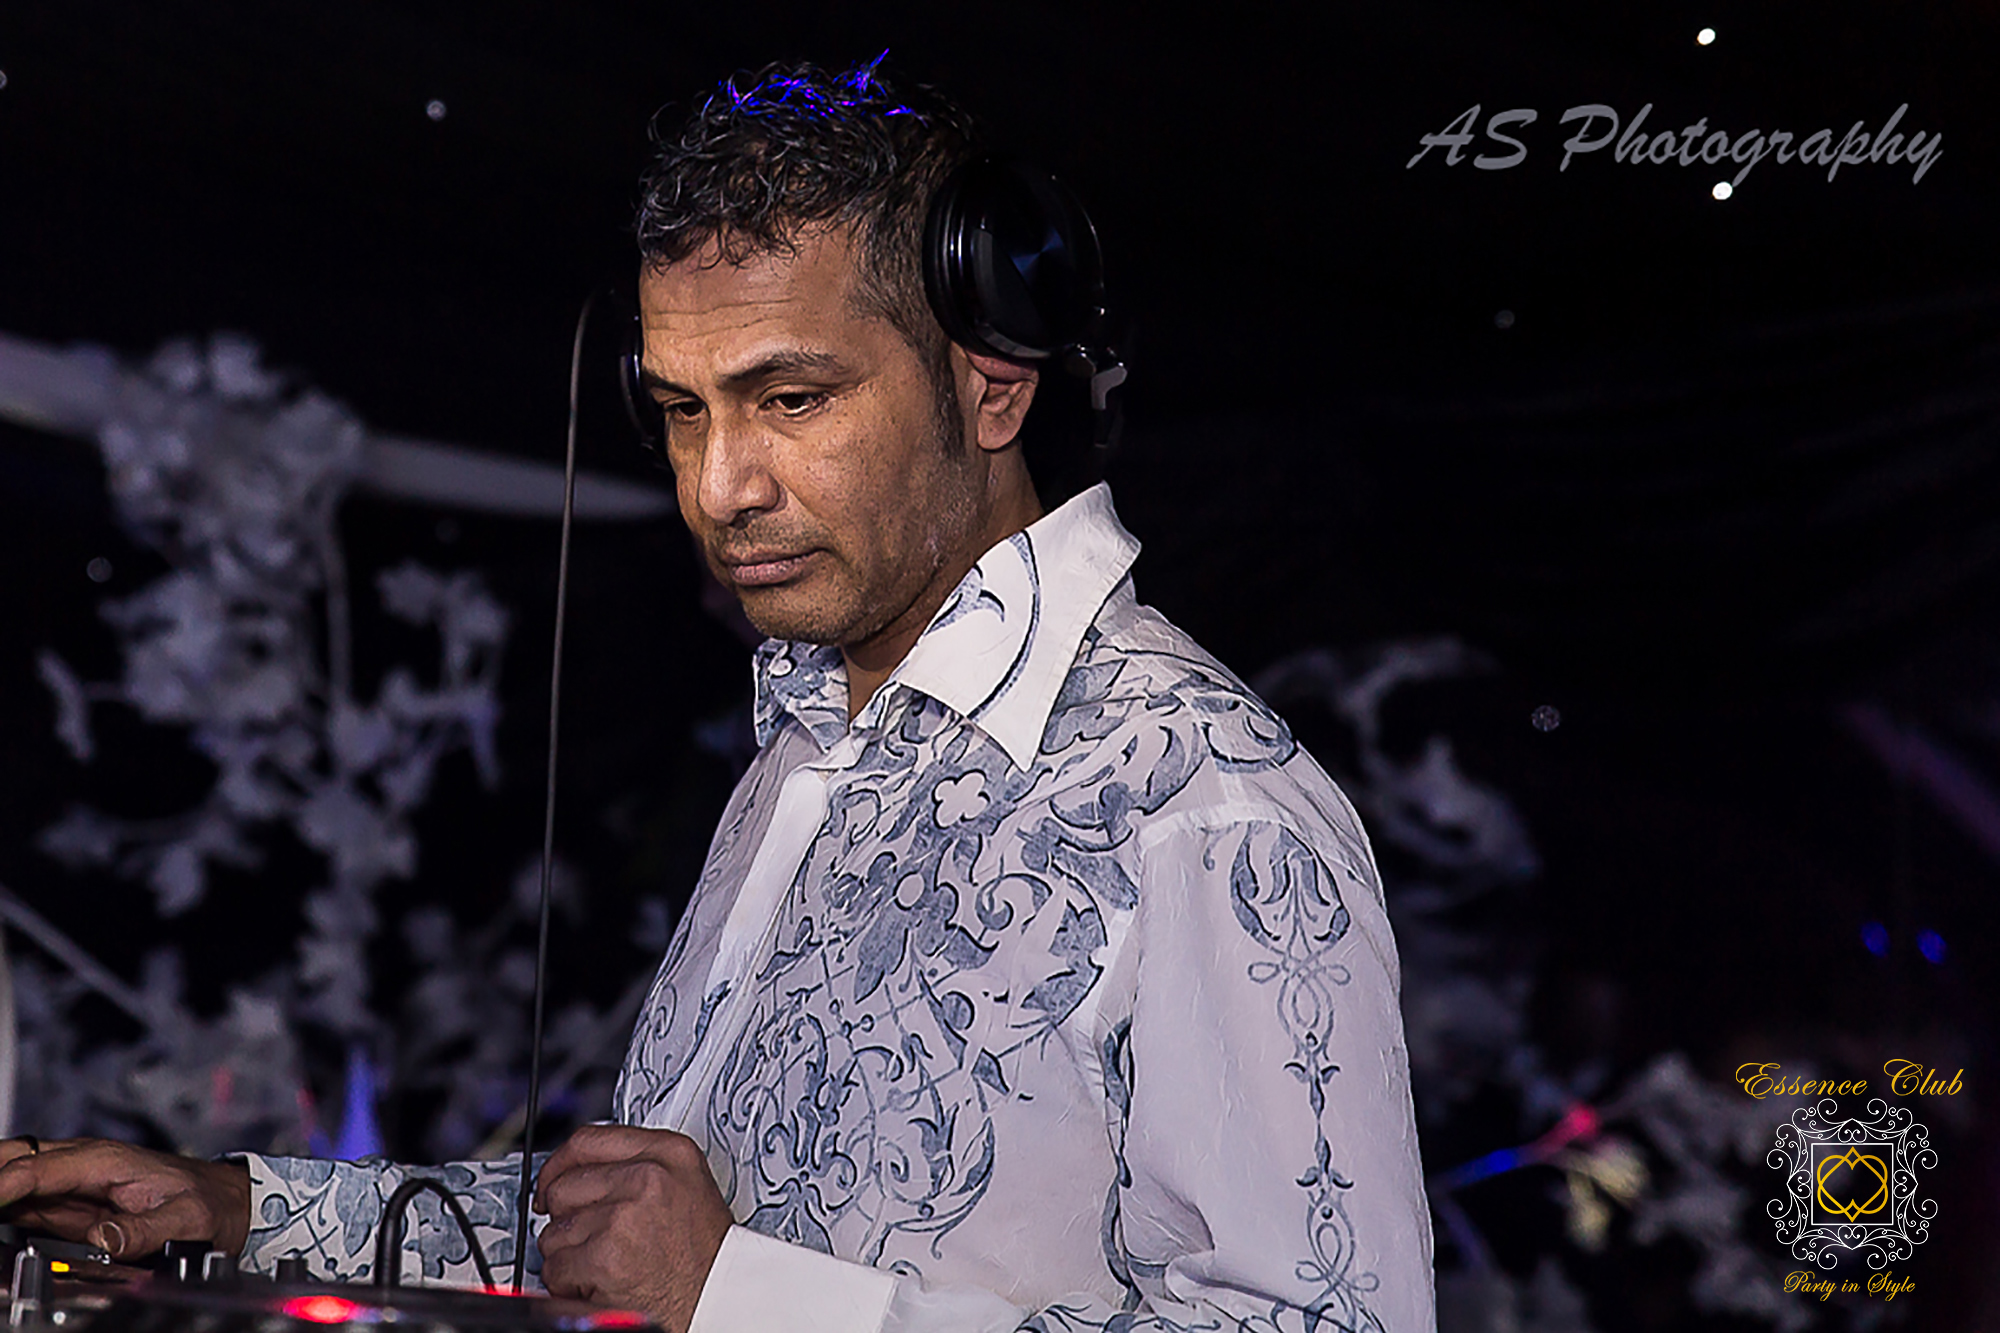 DJ Davey G Essence Club